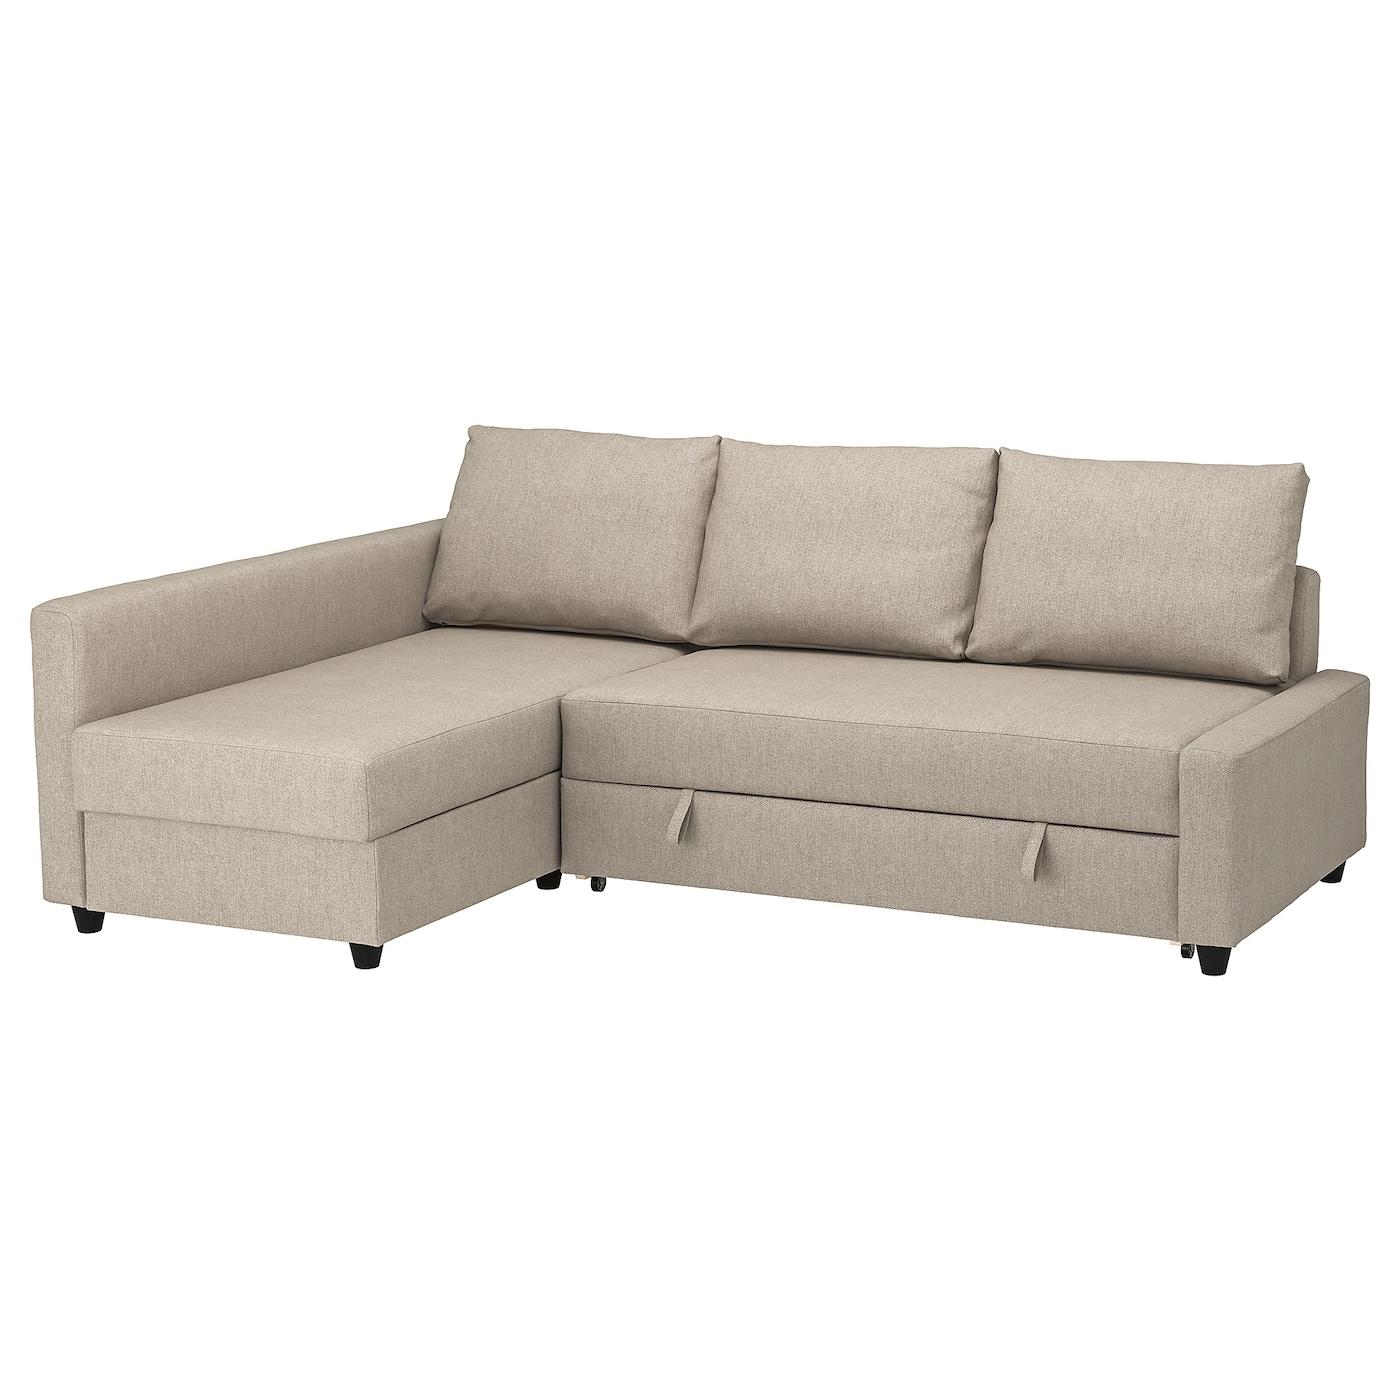 Friheten Sleeper Sectional 3 Seat W Storage Hyllie Beige Ikea